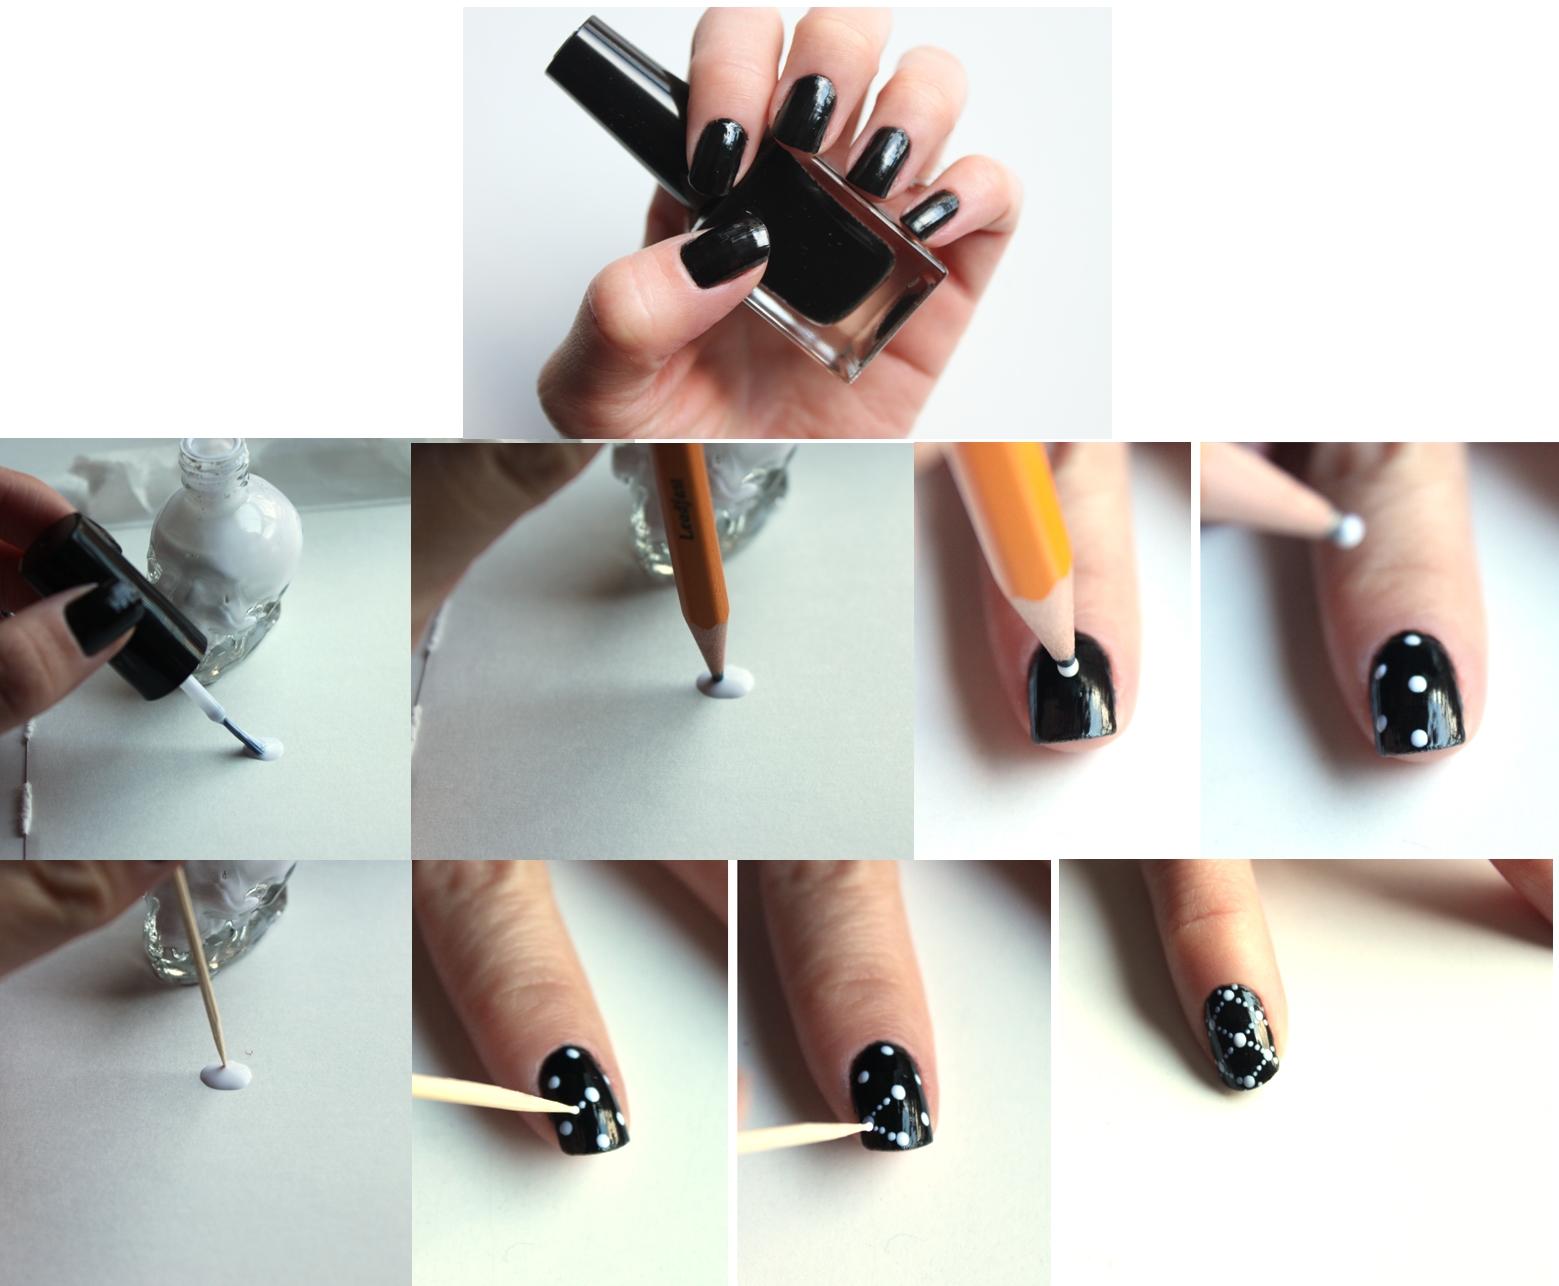 Как накрасит ногти в домашних условиях видео